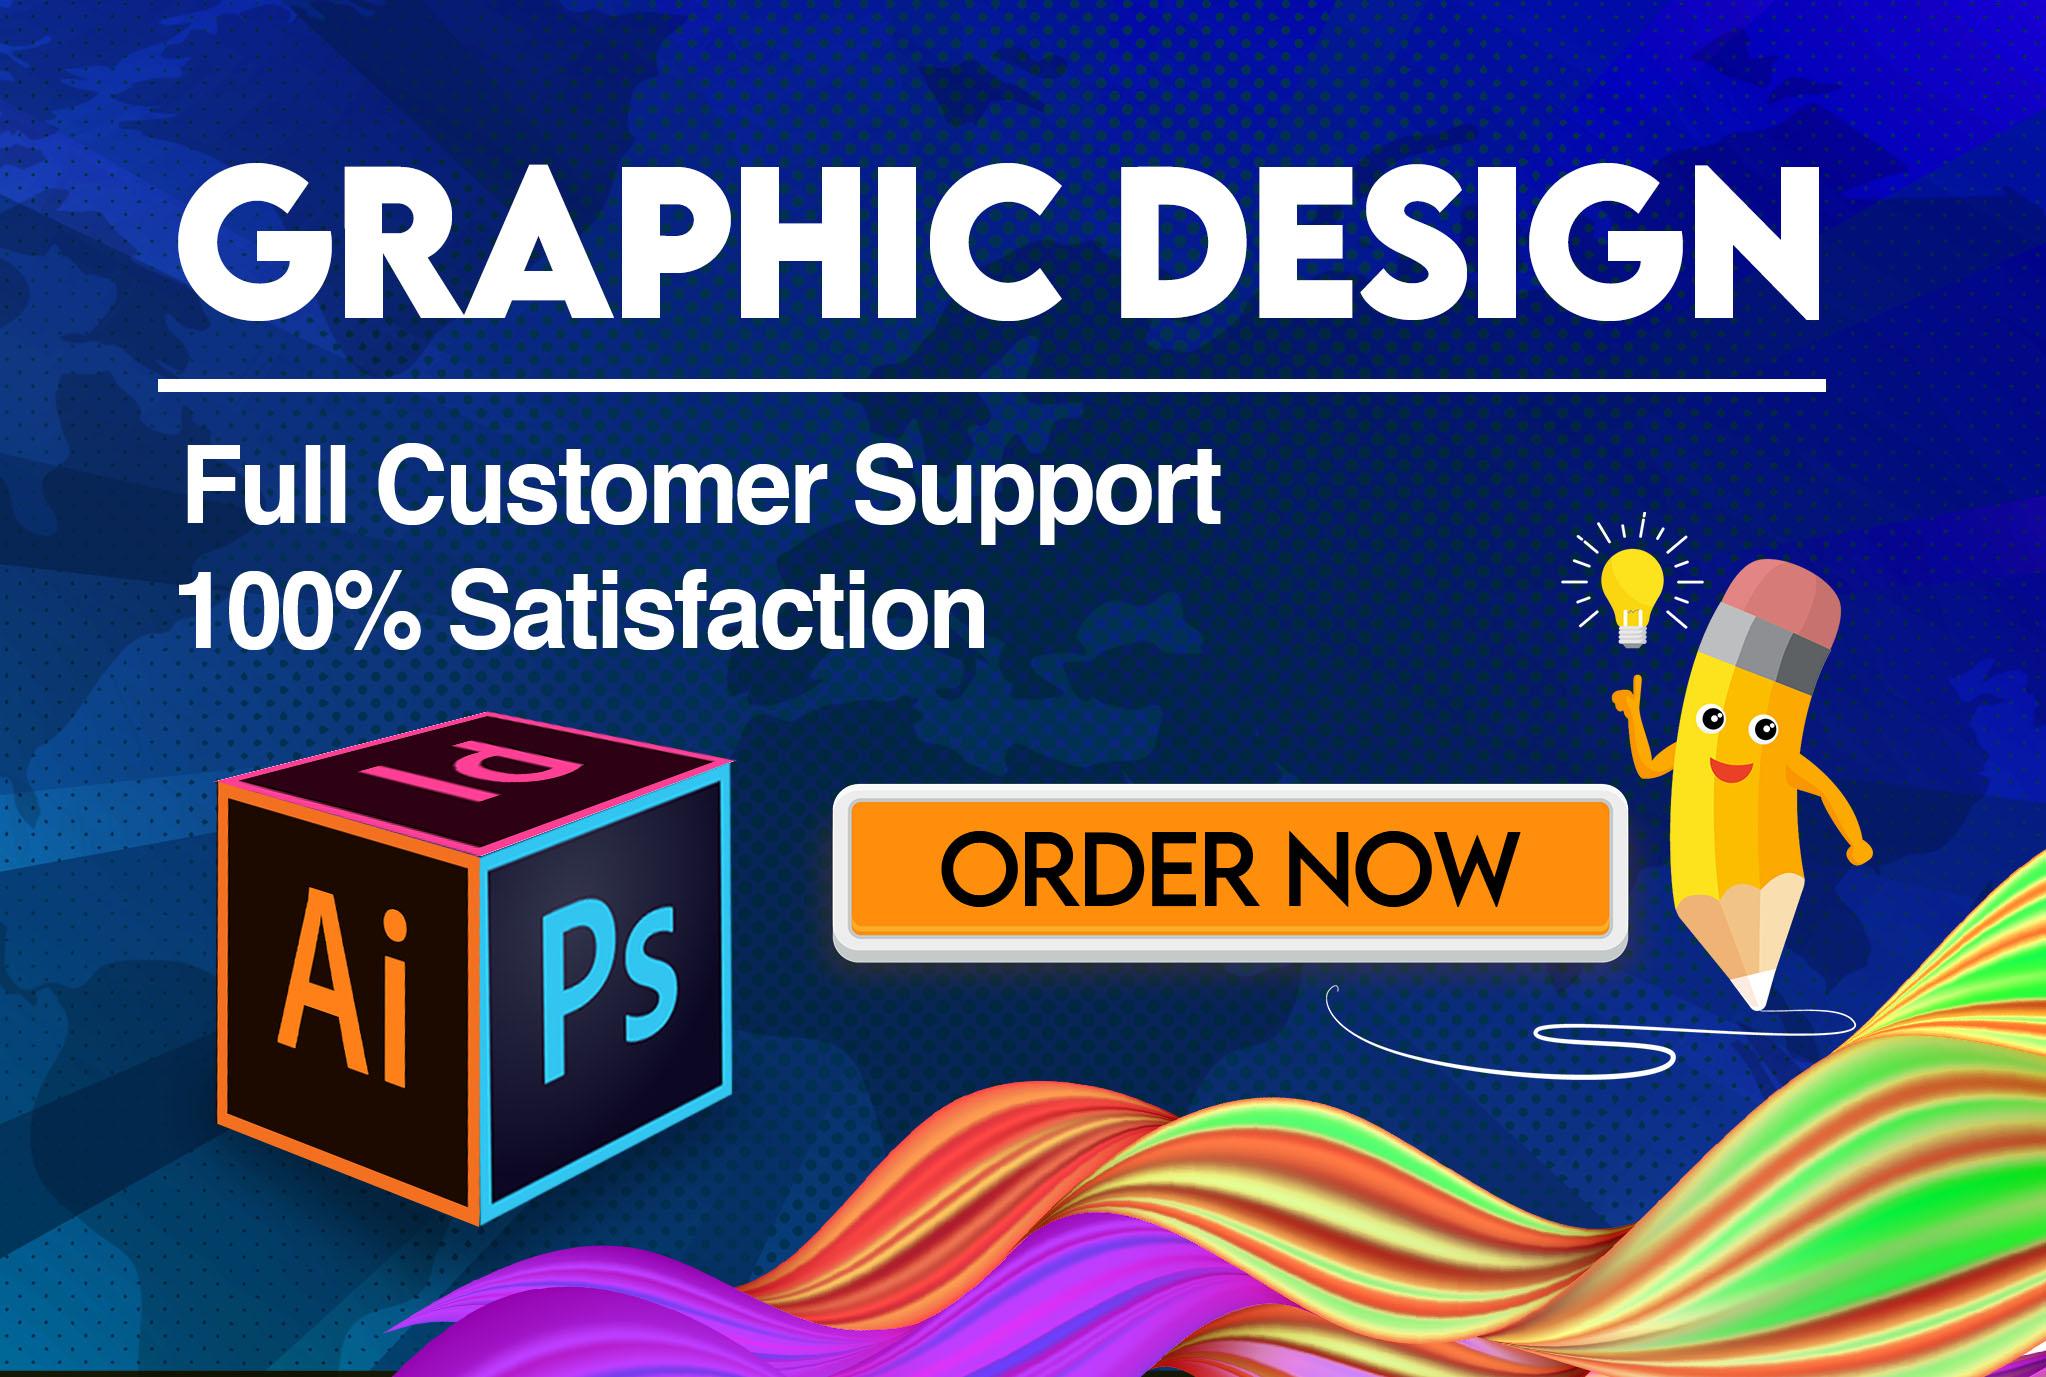 I will your freelance graphic designer